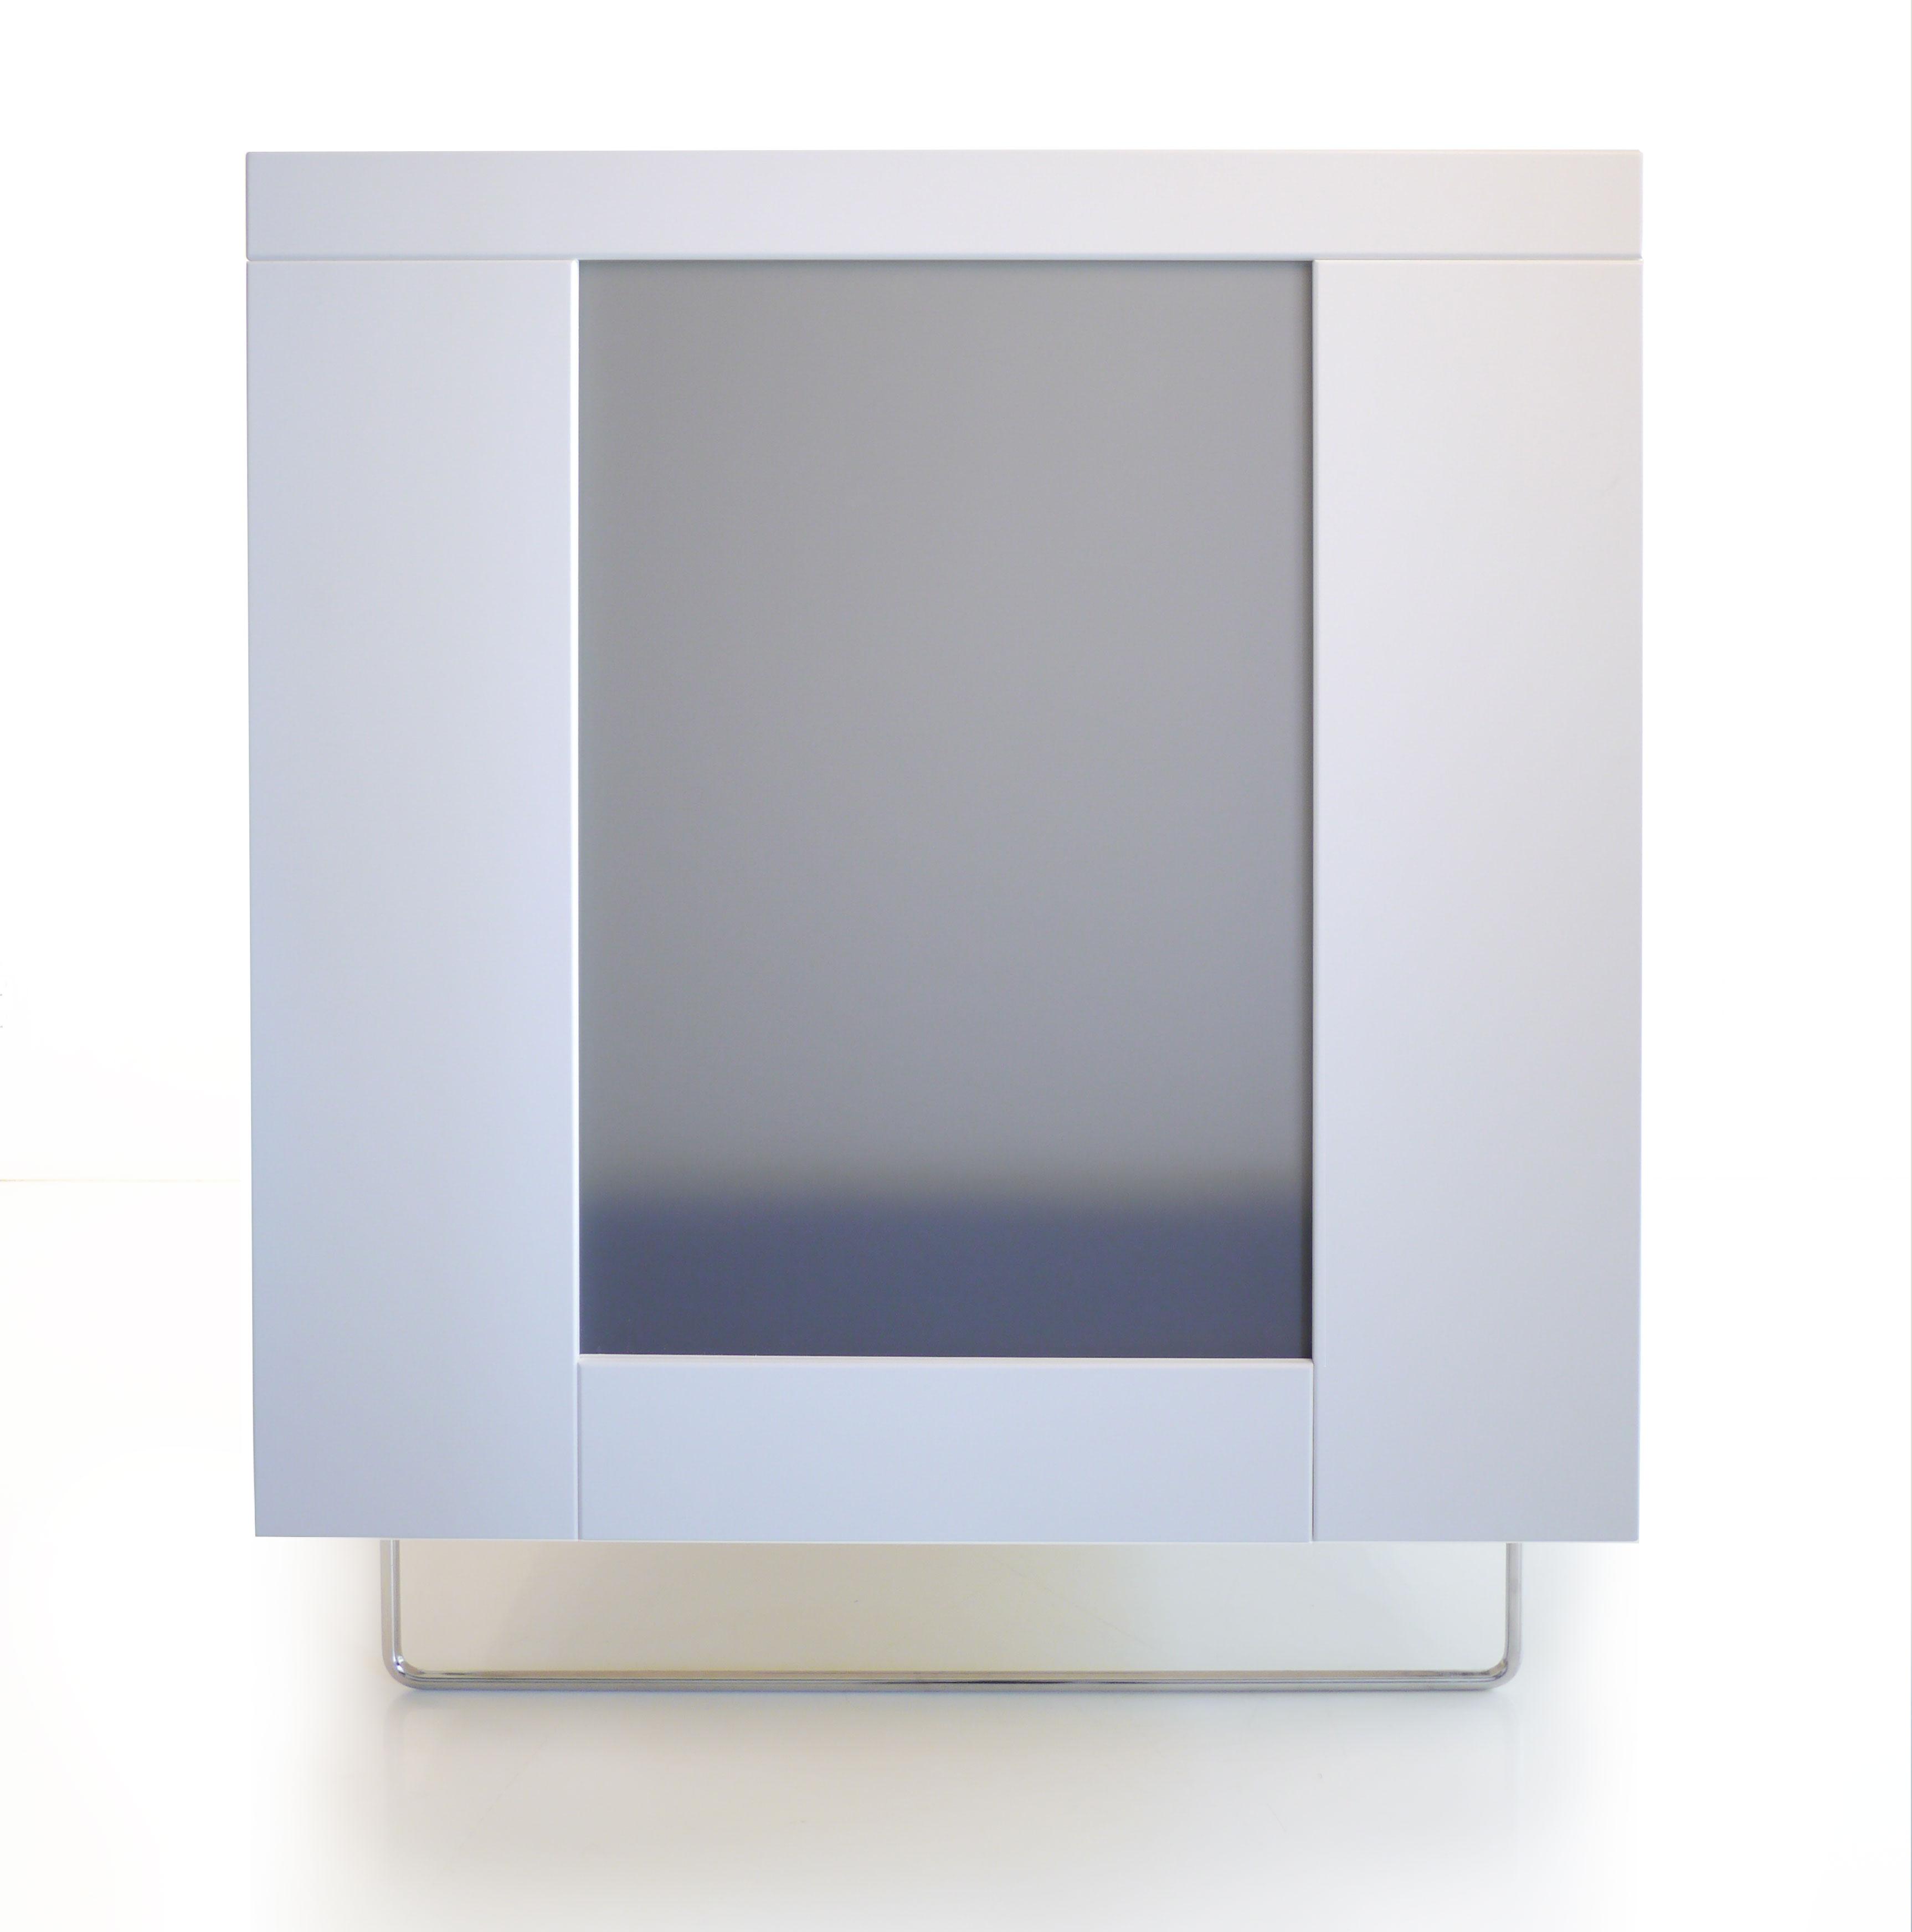 Кроватка Alto Graphite Translucent Acrylic Spot on Square